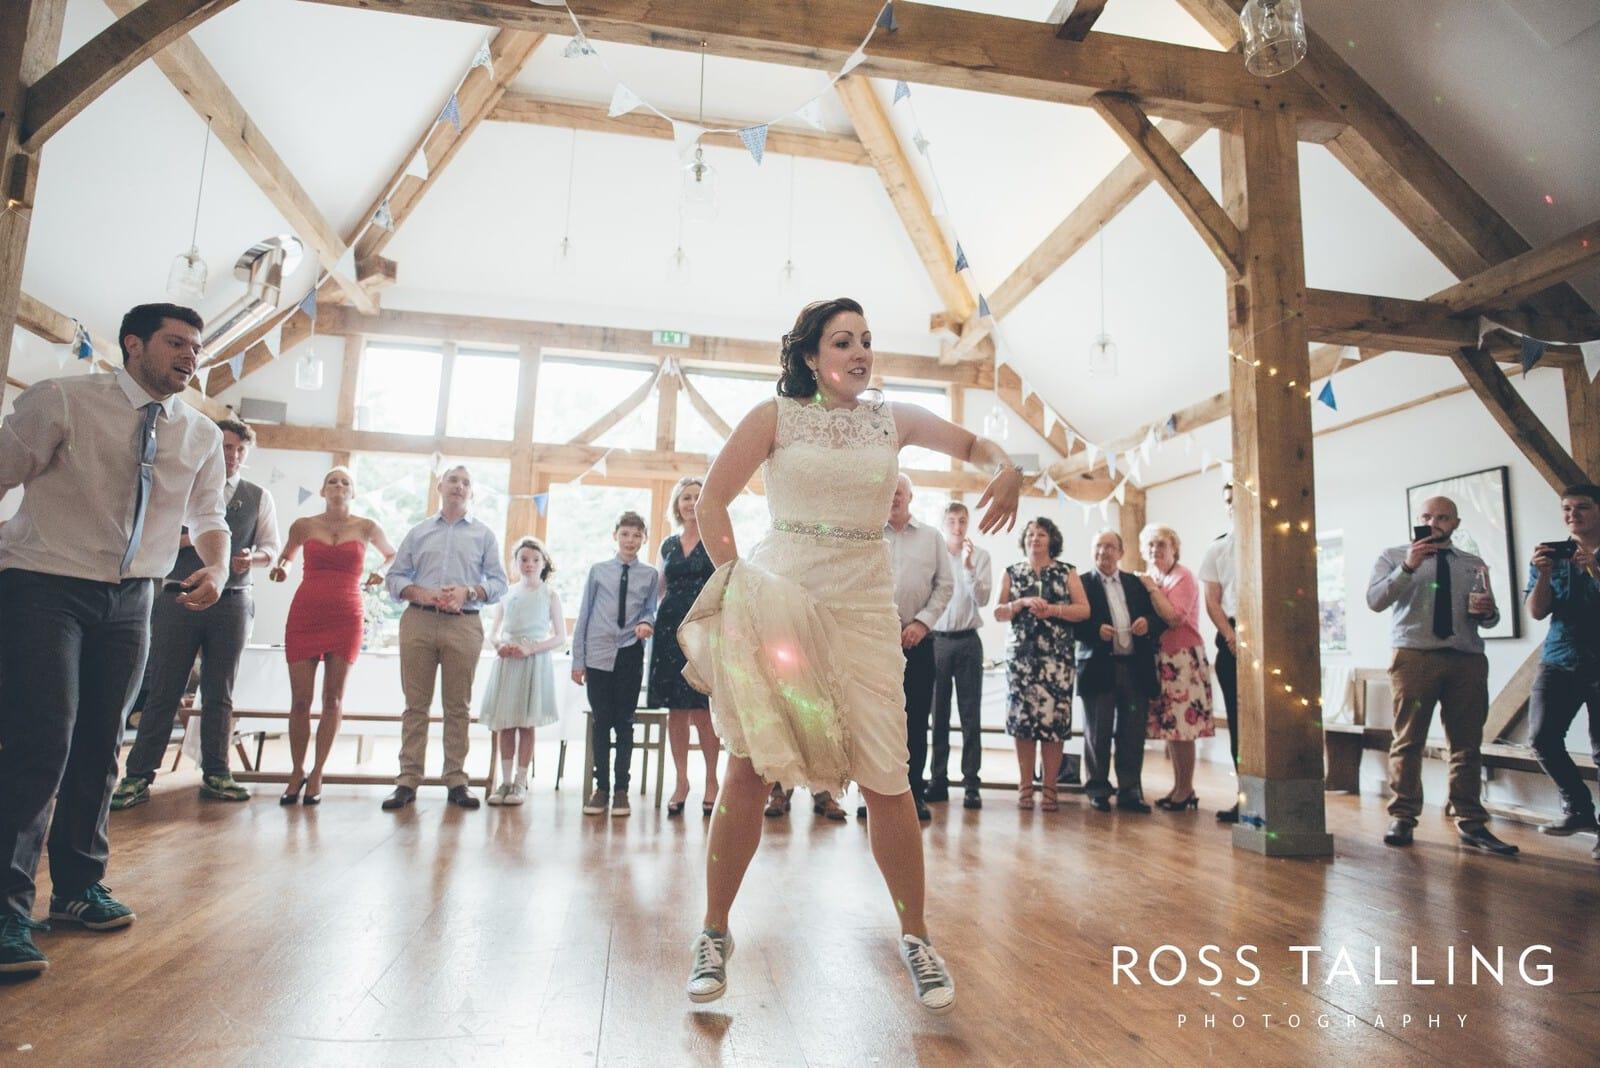 Coolest First Dance Ever Breakdancing Bride and Groom Jasmin and Ben Barnicoat_0008